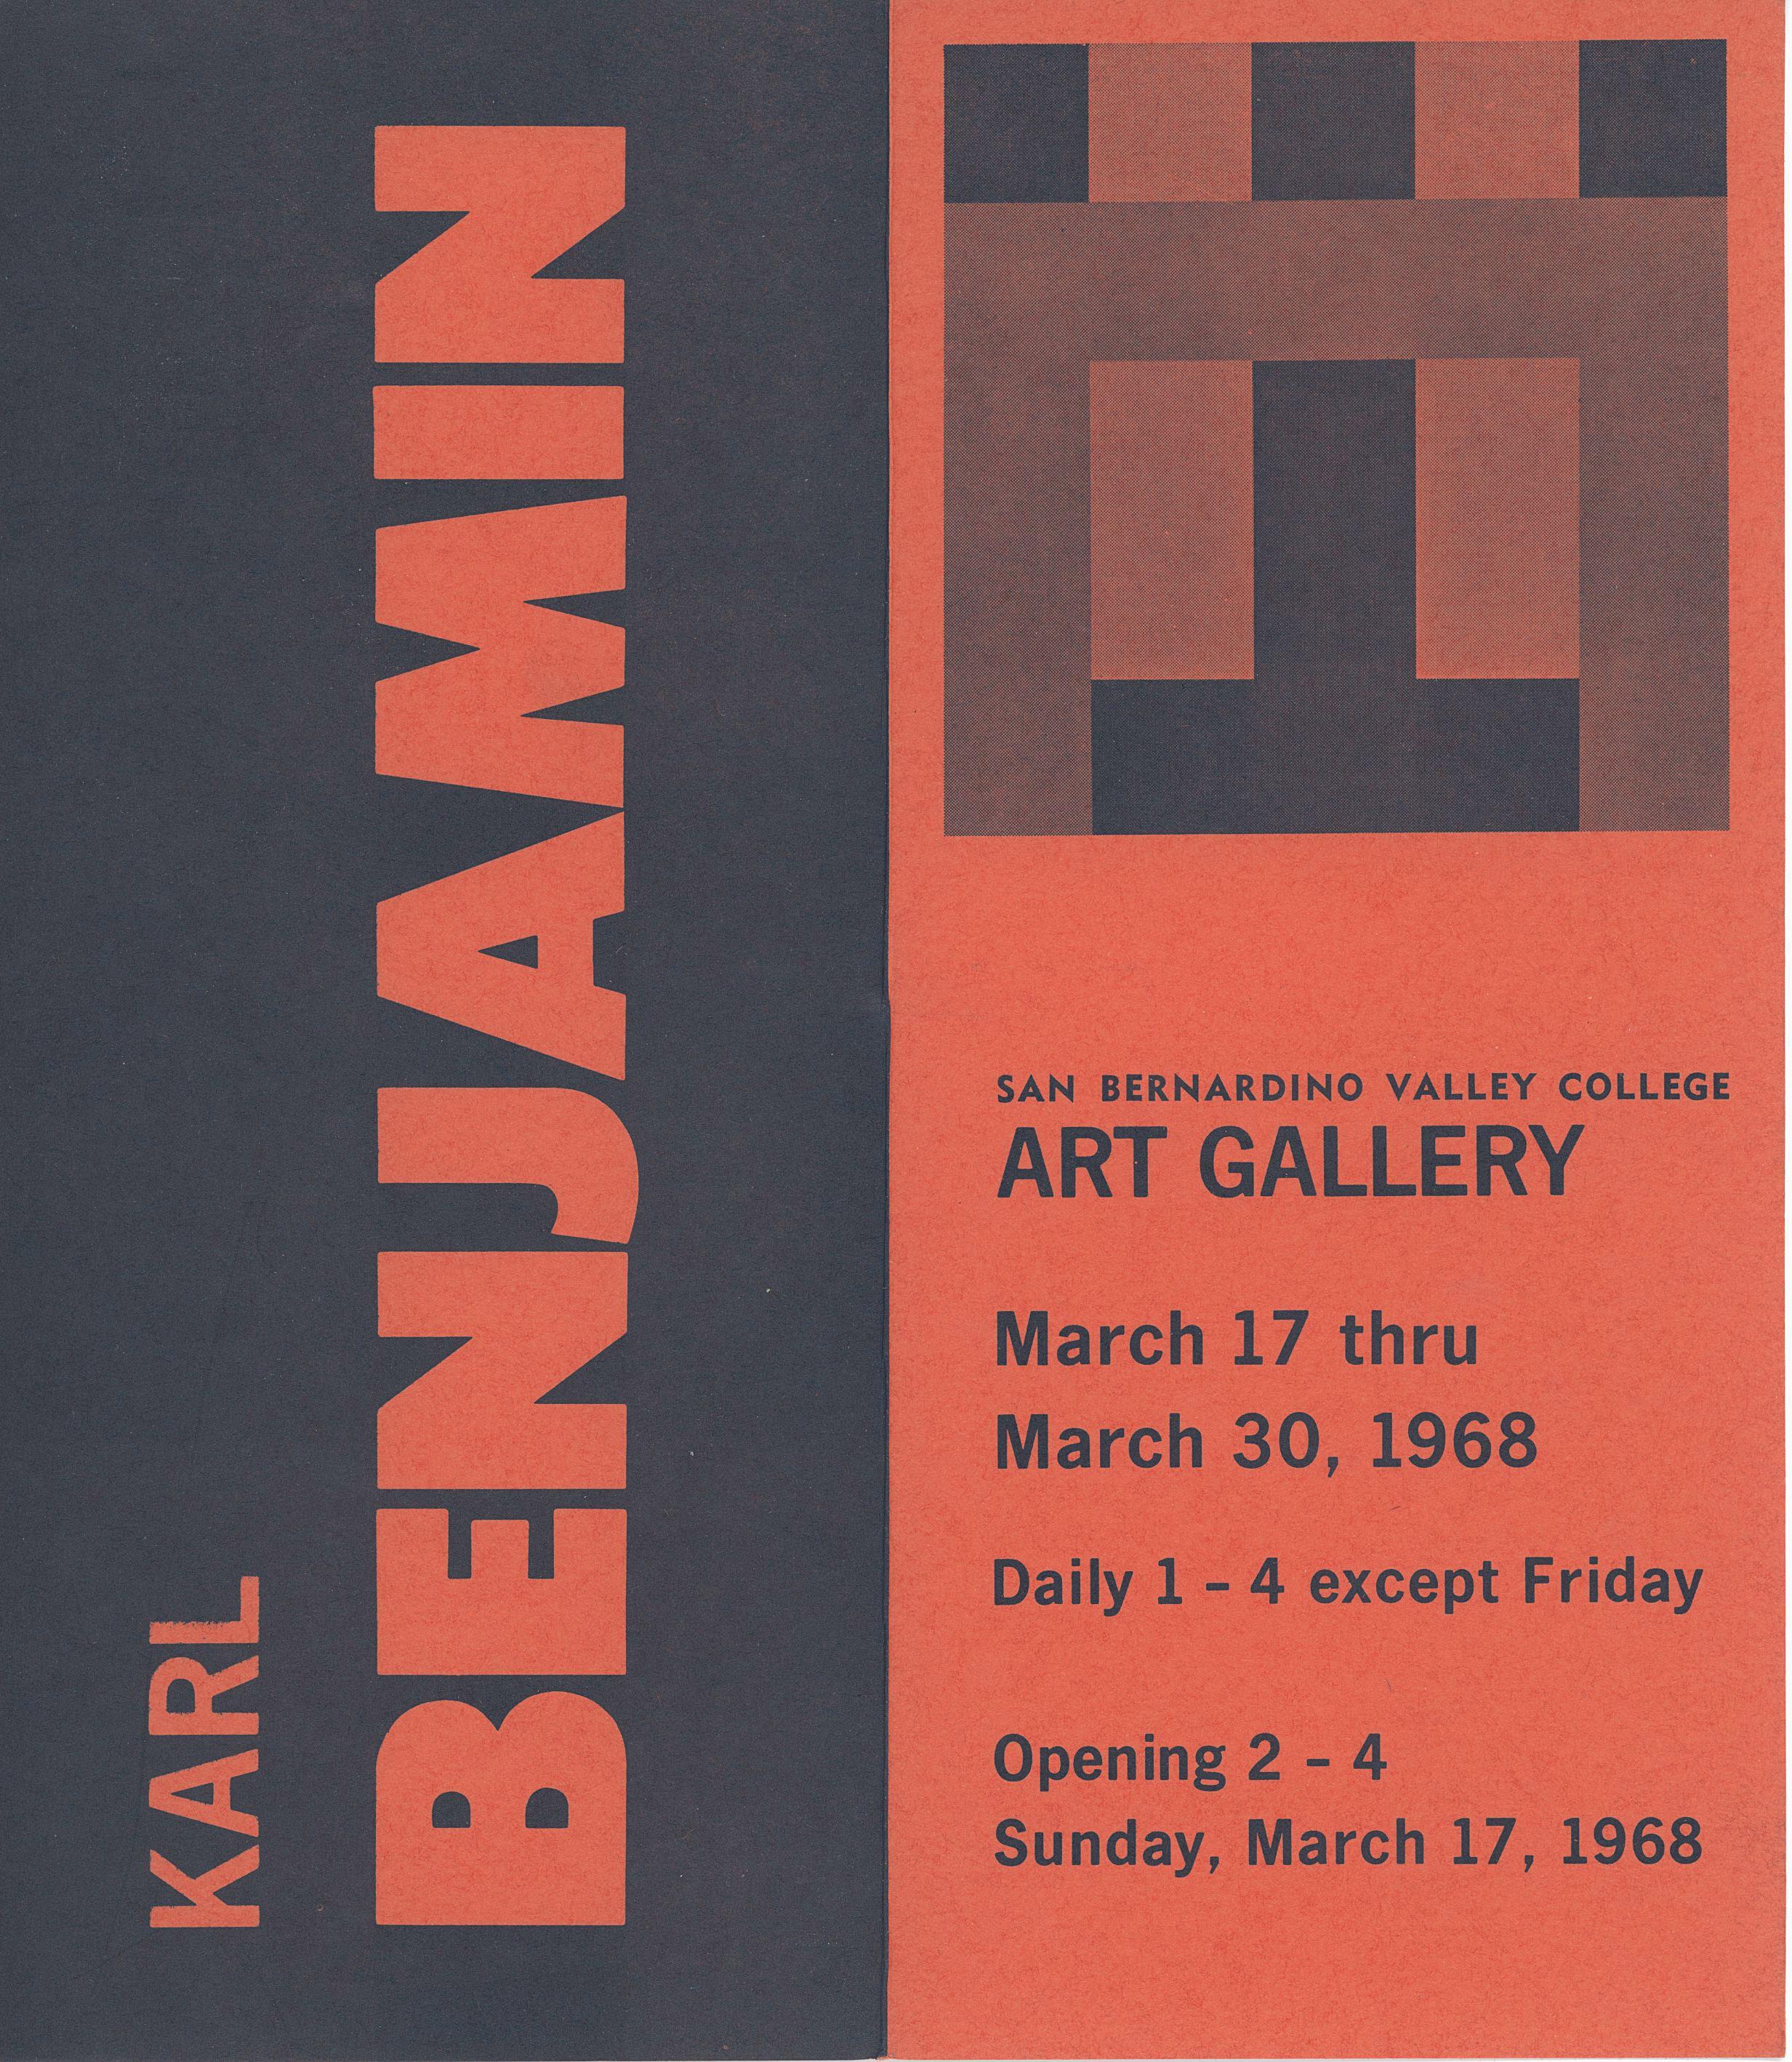 1968 San Bernardino Valley College.jpg